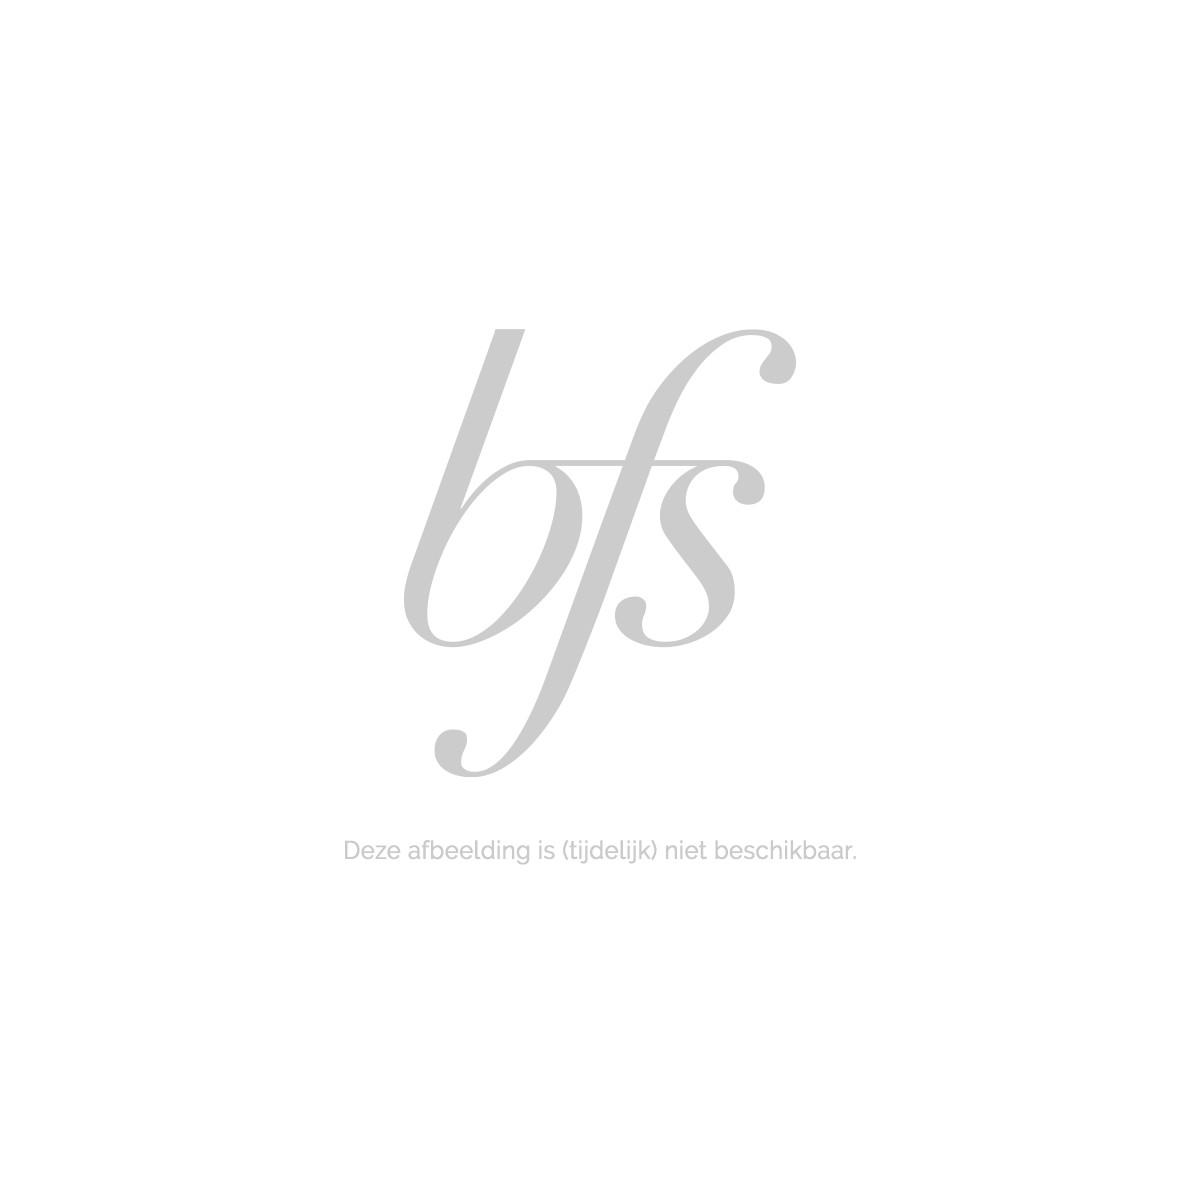 Body and Bess Anti Age Skin Control Serum 15 Ml